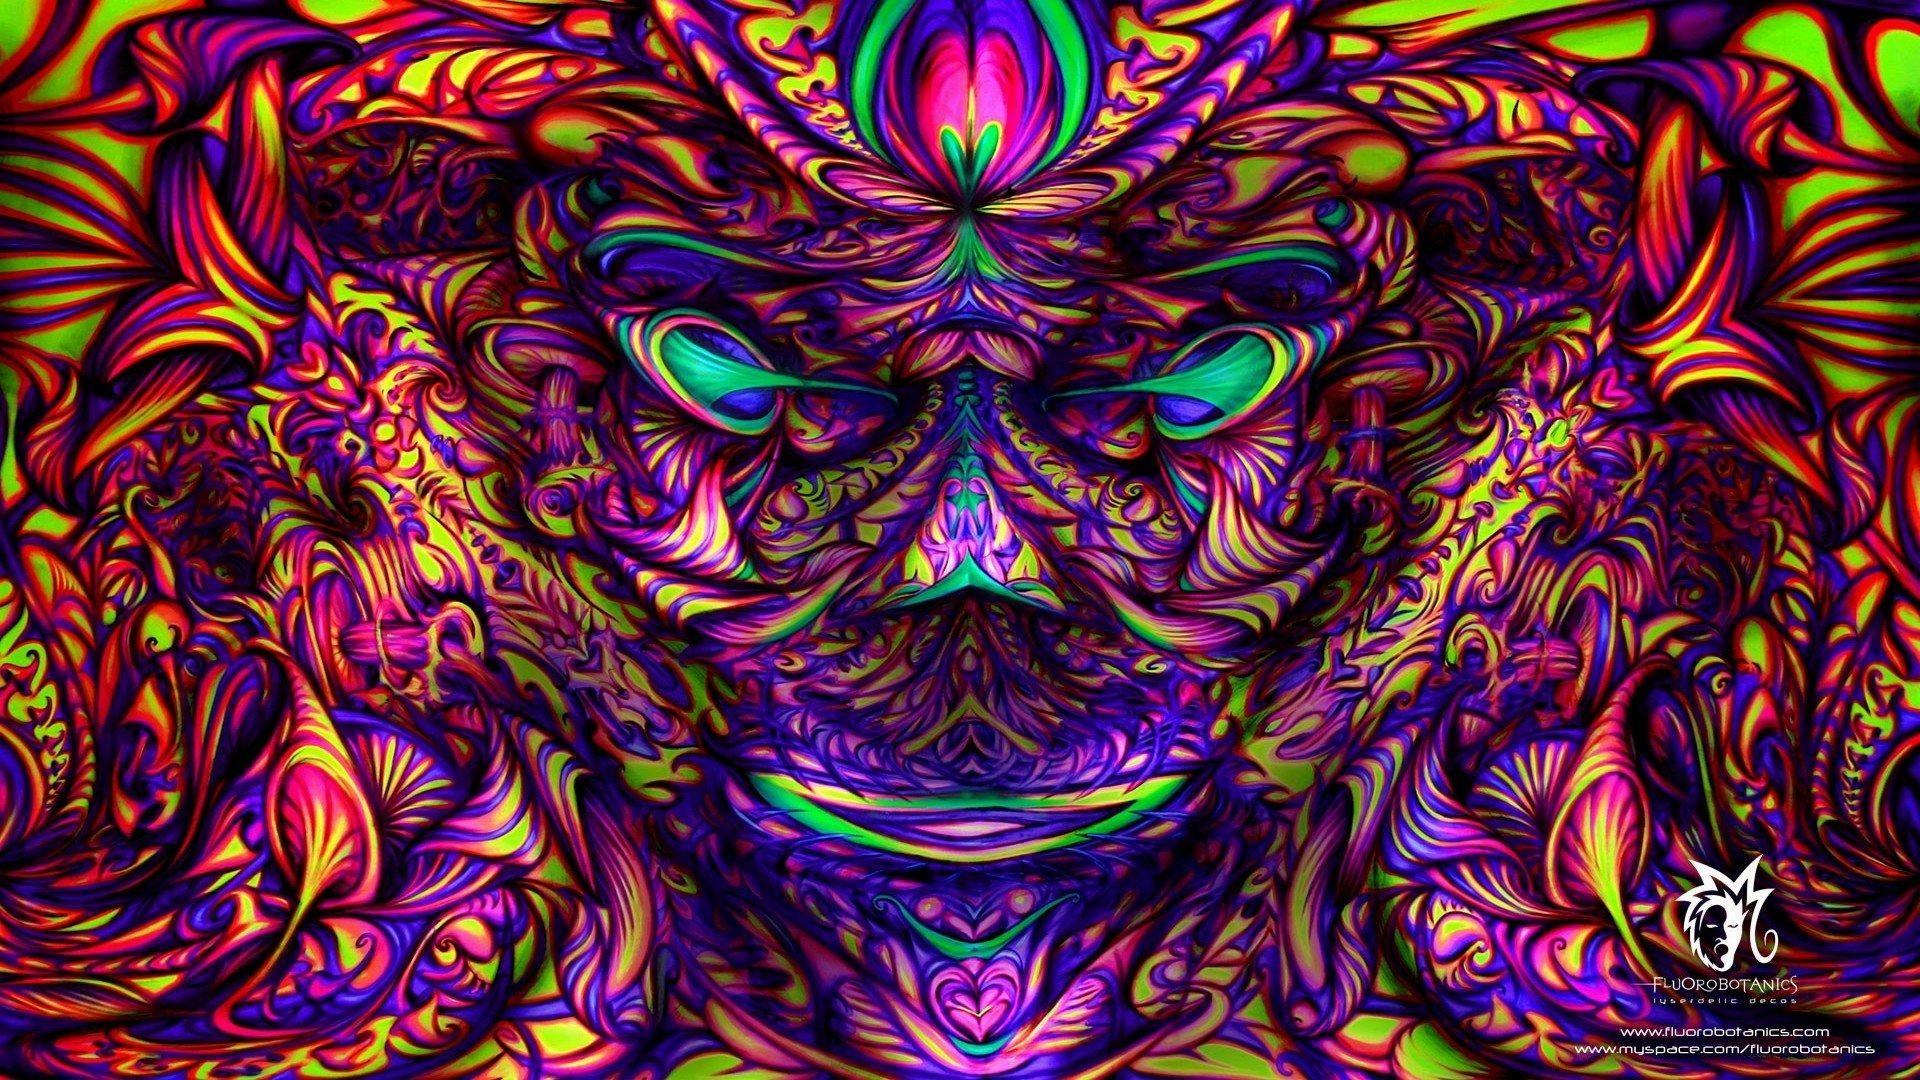 Psychedelic Desktop Wallpaper Hd 68 Images